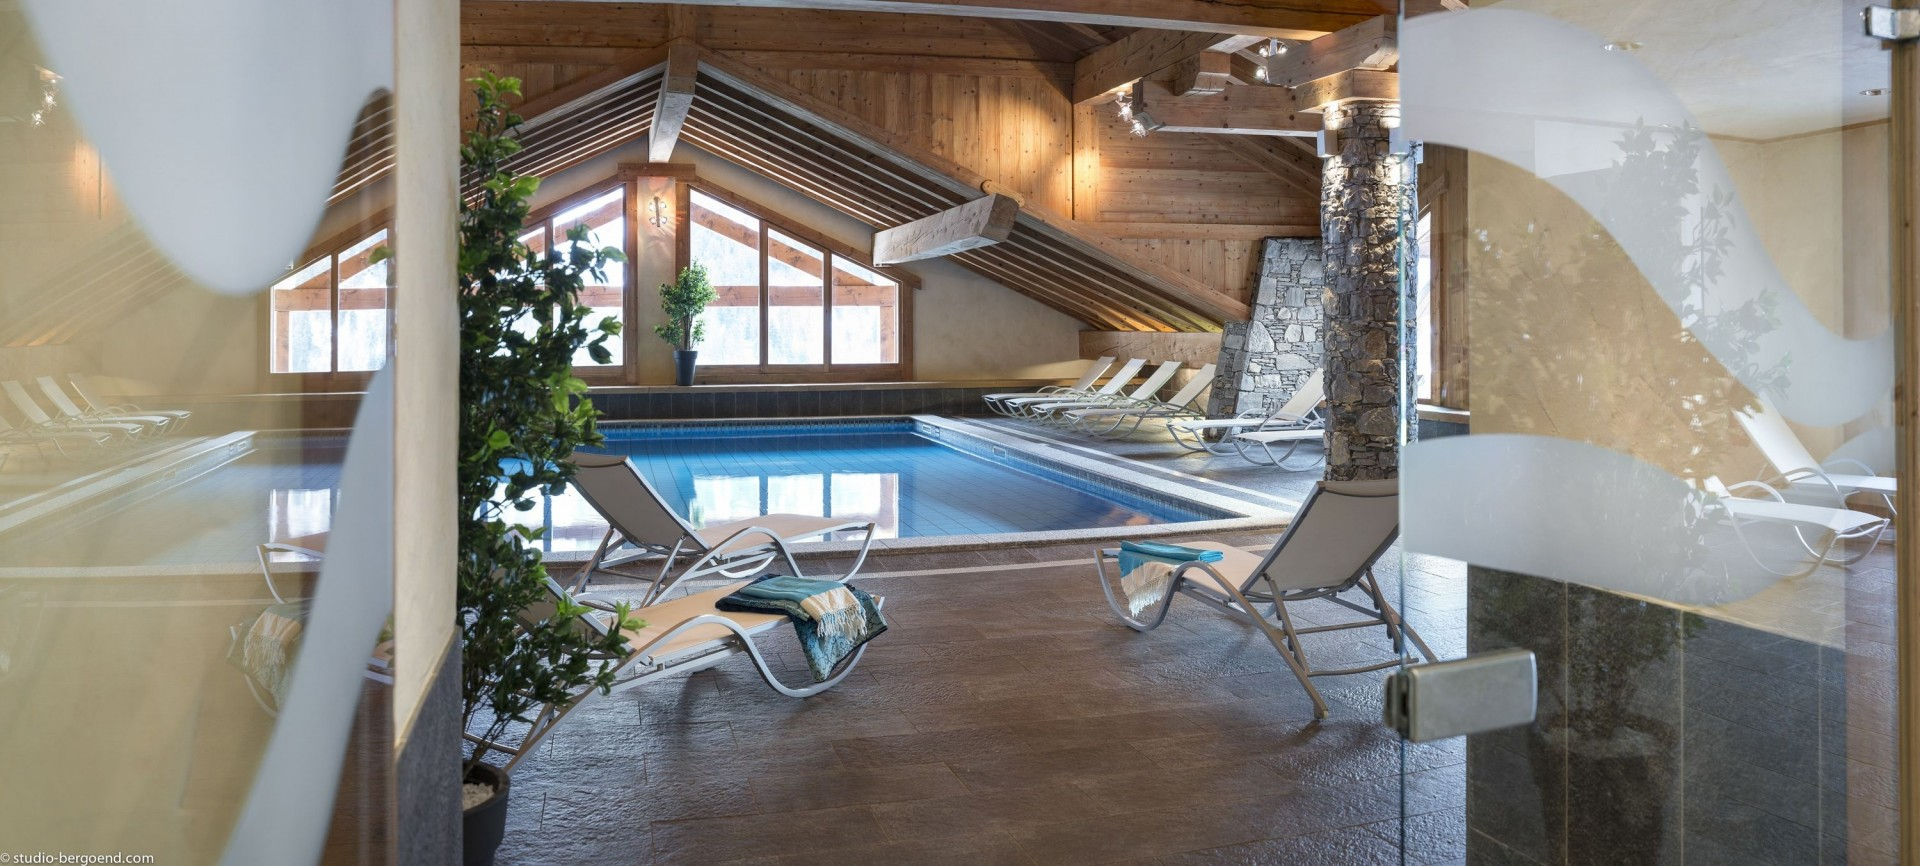 champagny-en-vanoise-location-appartement-luxe-chapminite-duplex